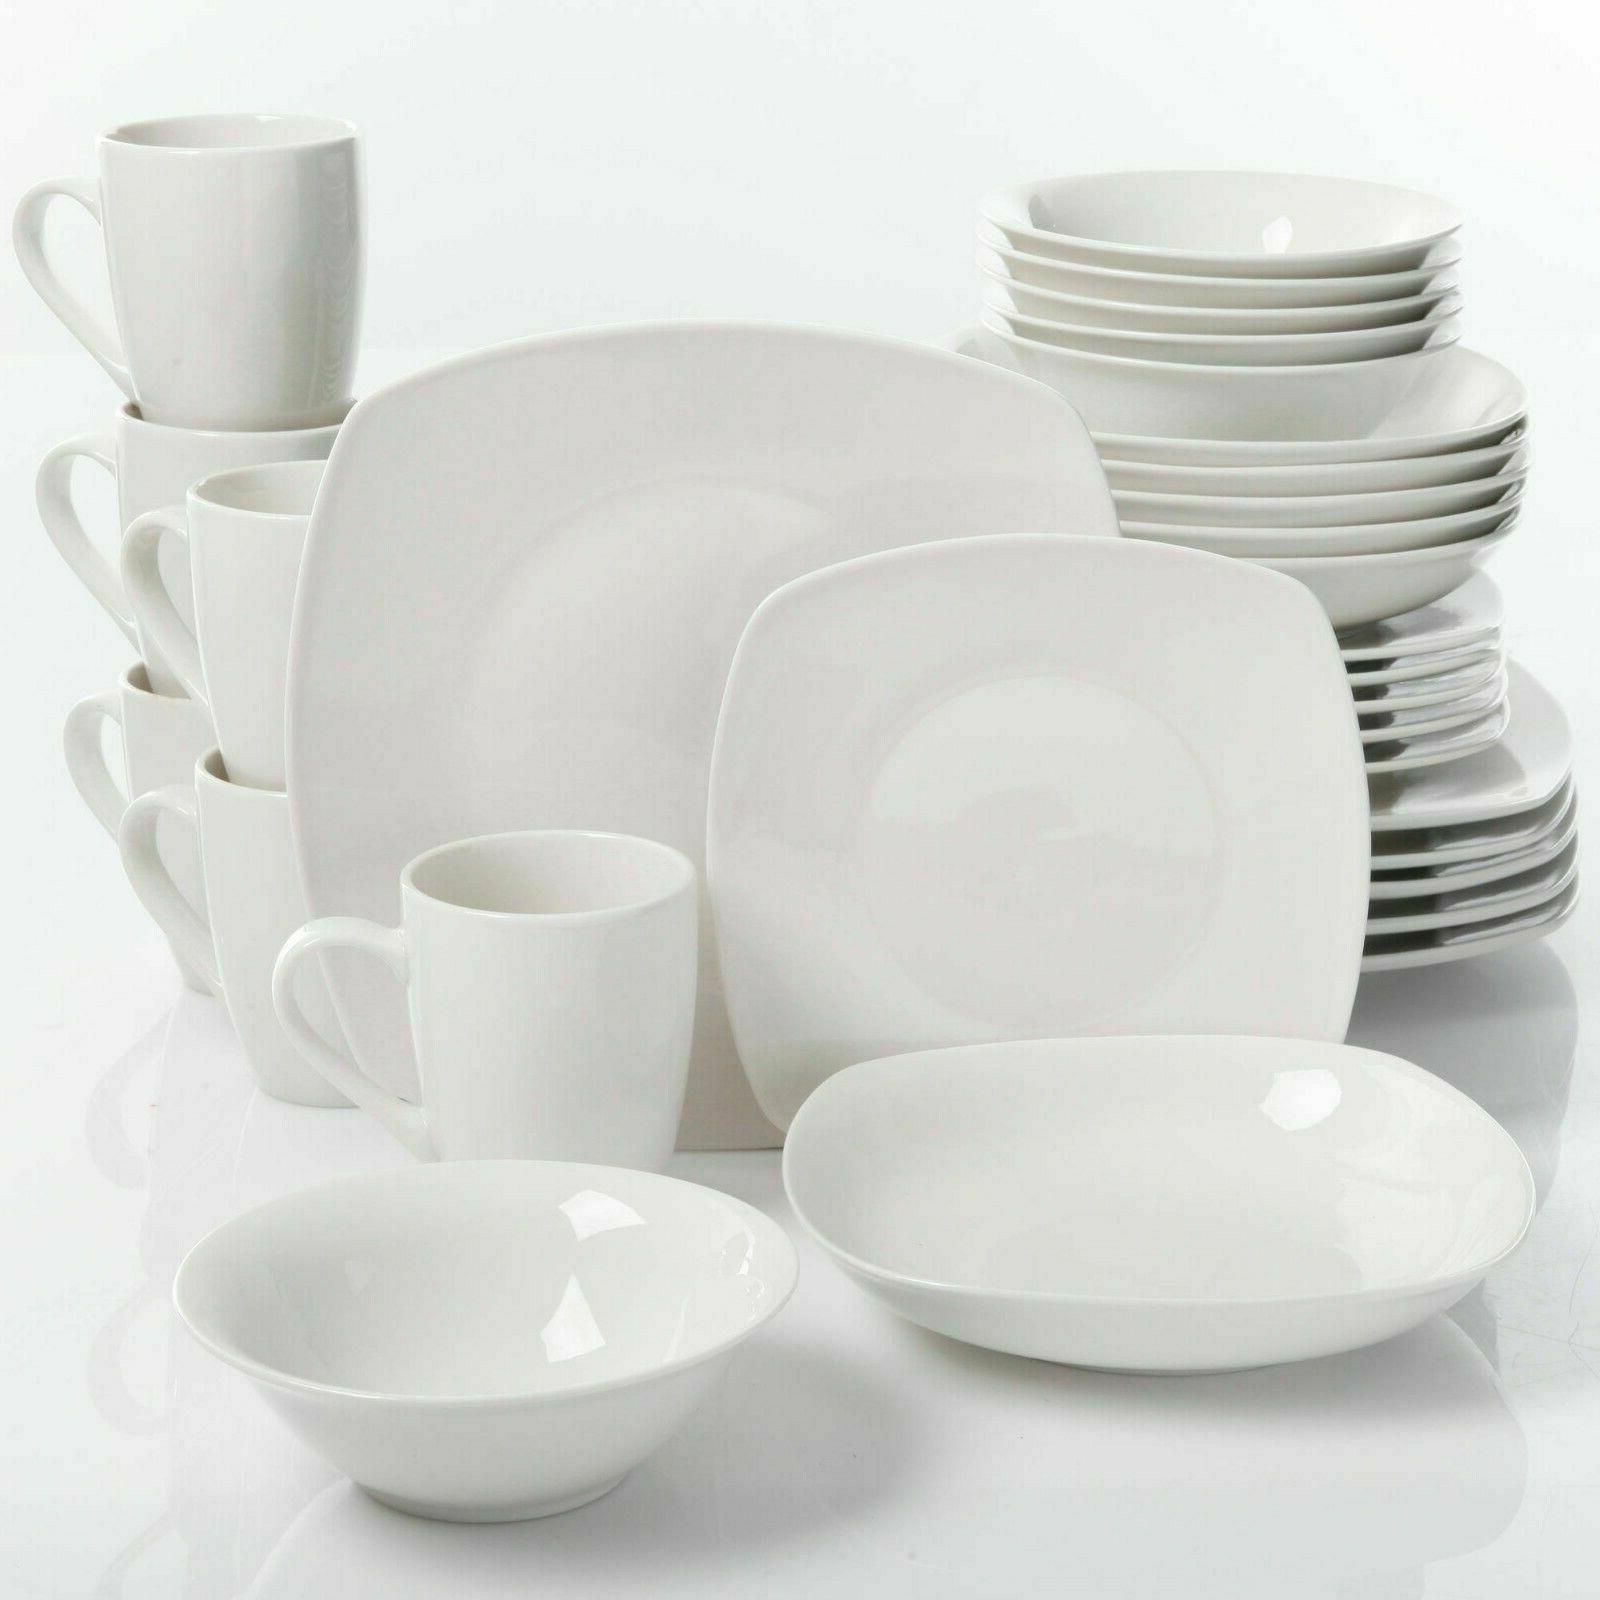 porcelain dinnerware set square dinner plates dish